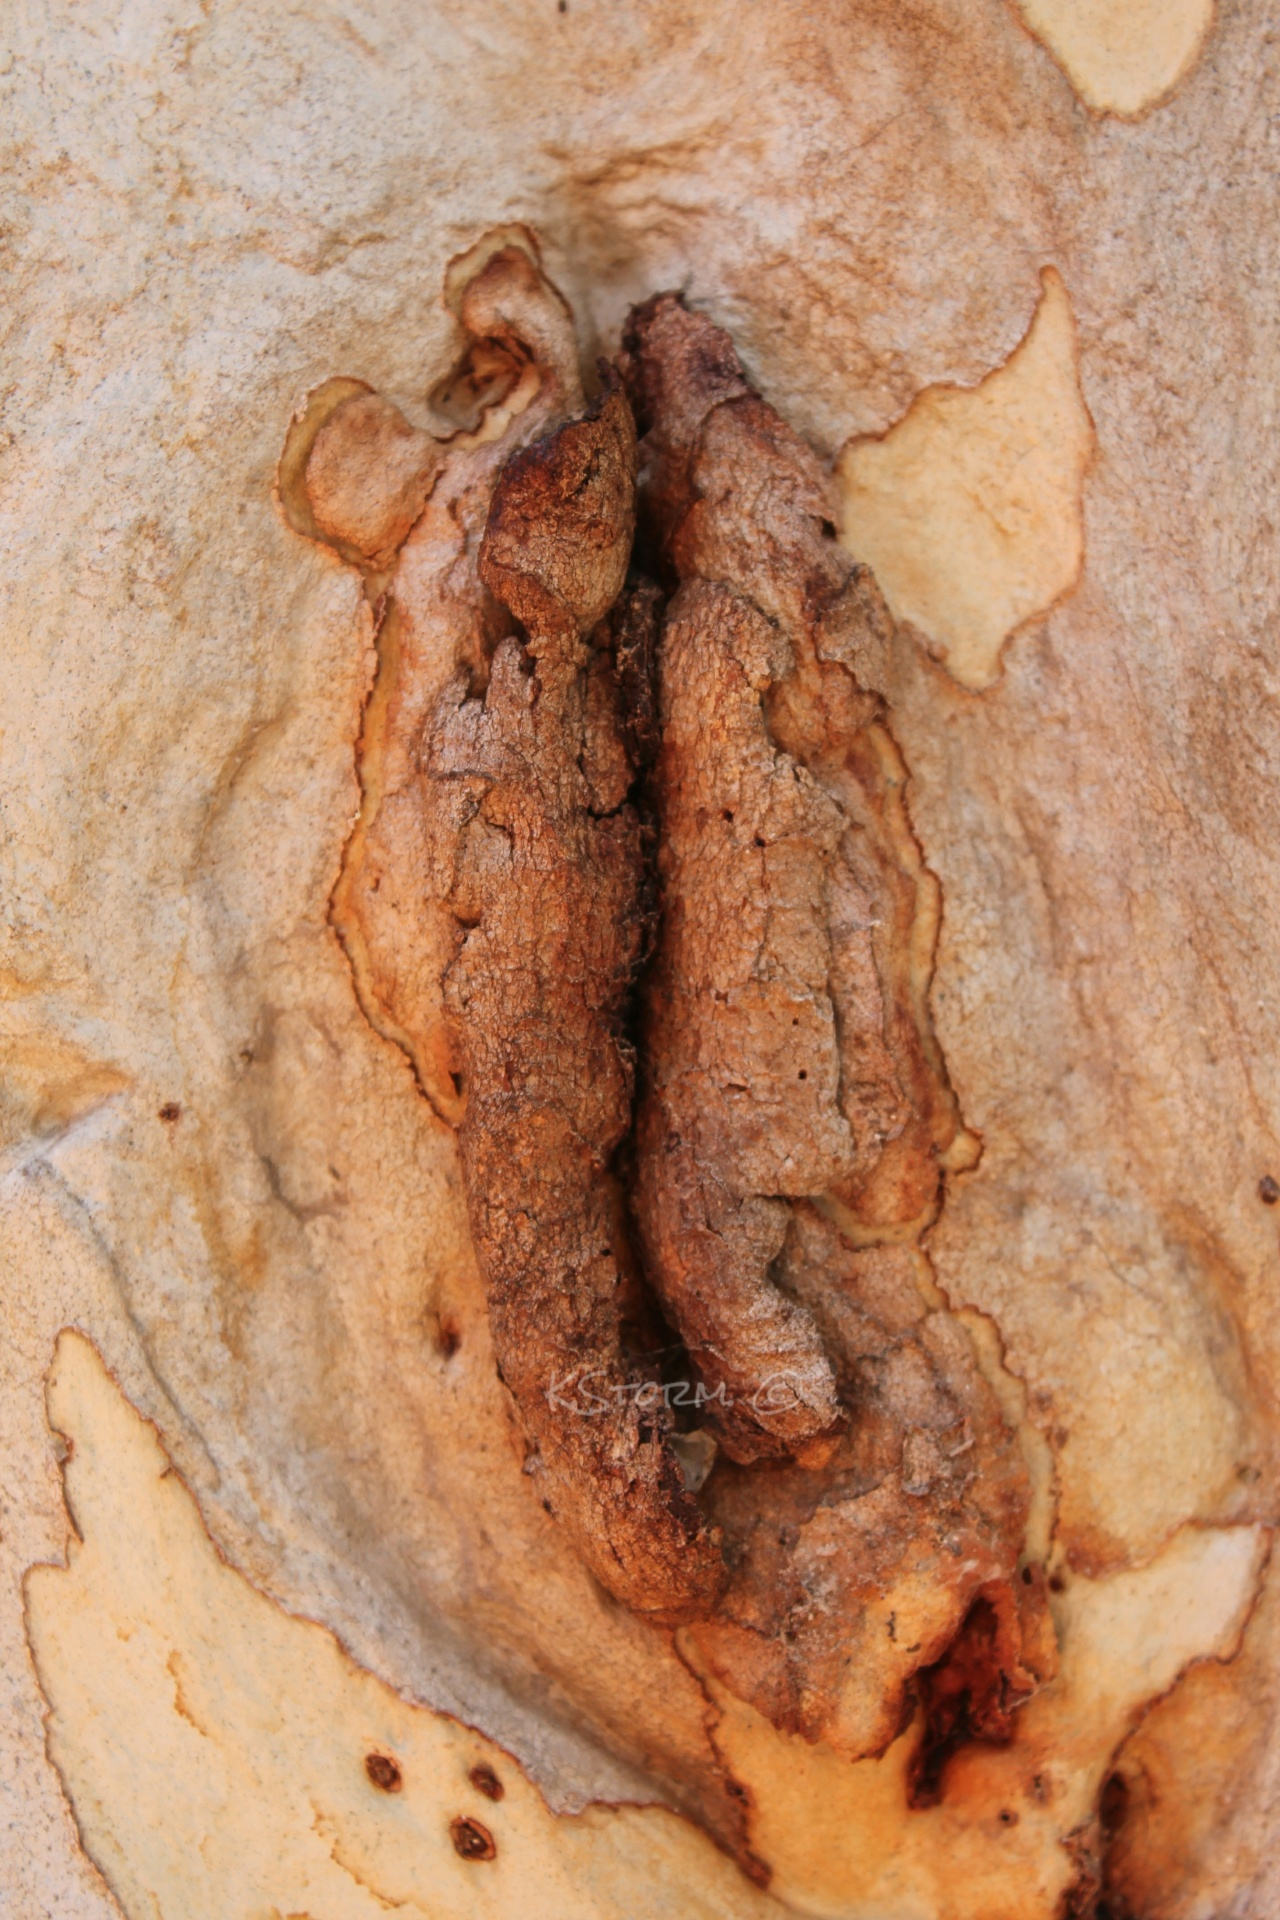 Natures Vagina